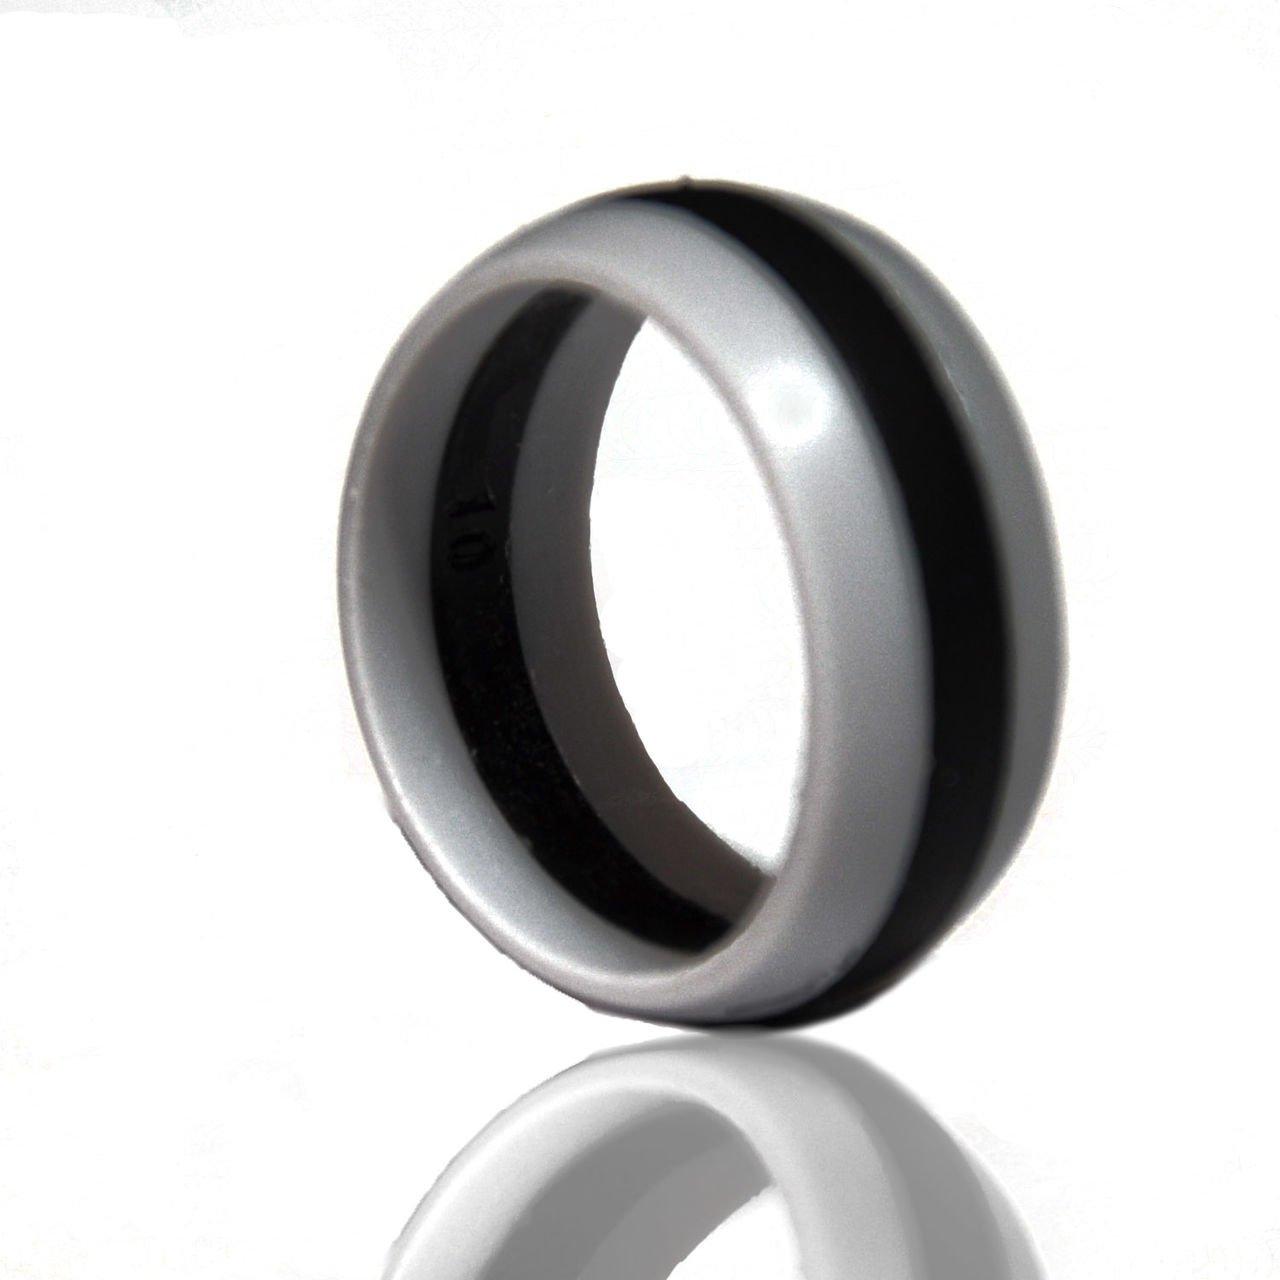 cool wedding ring 2016 golf grip wedding ring With wedding ring grip